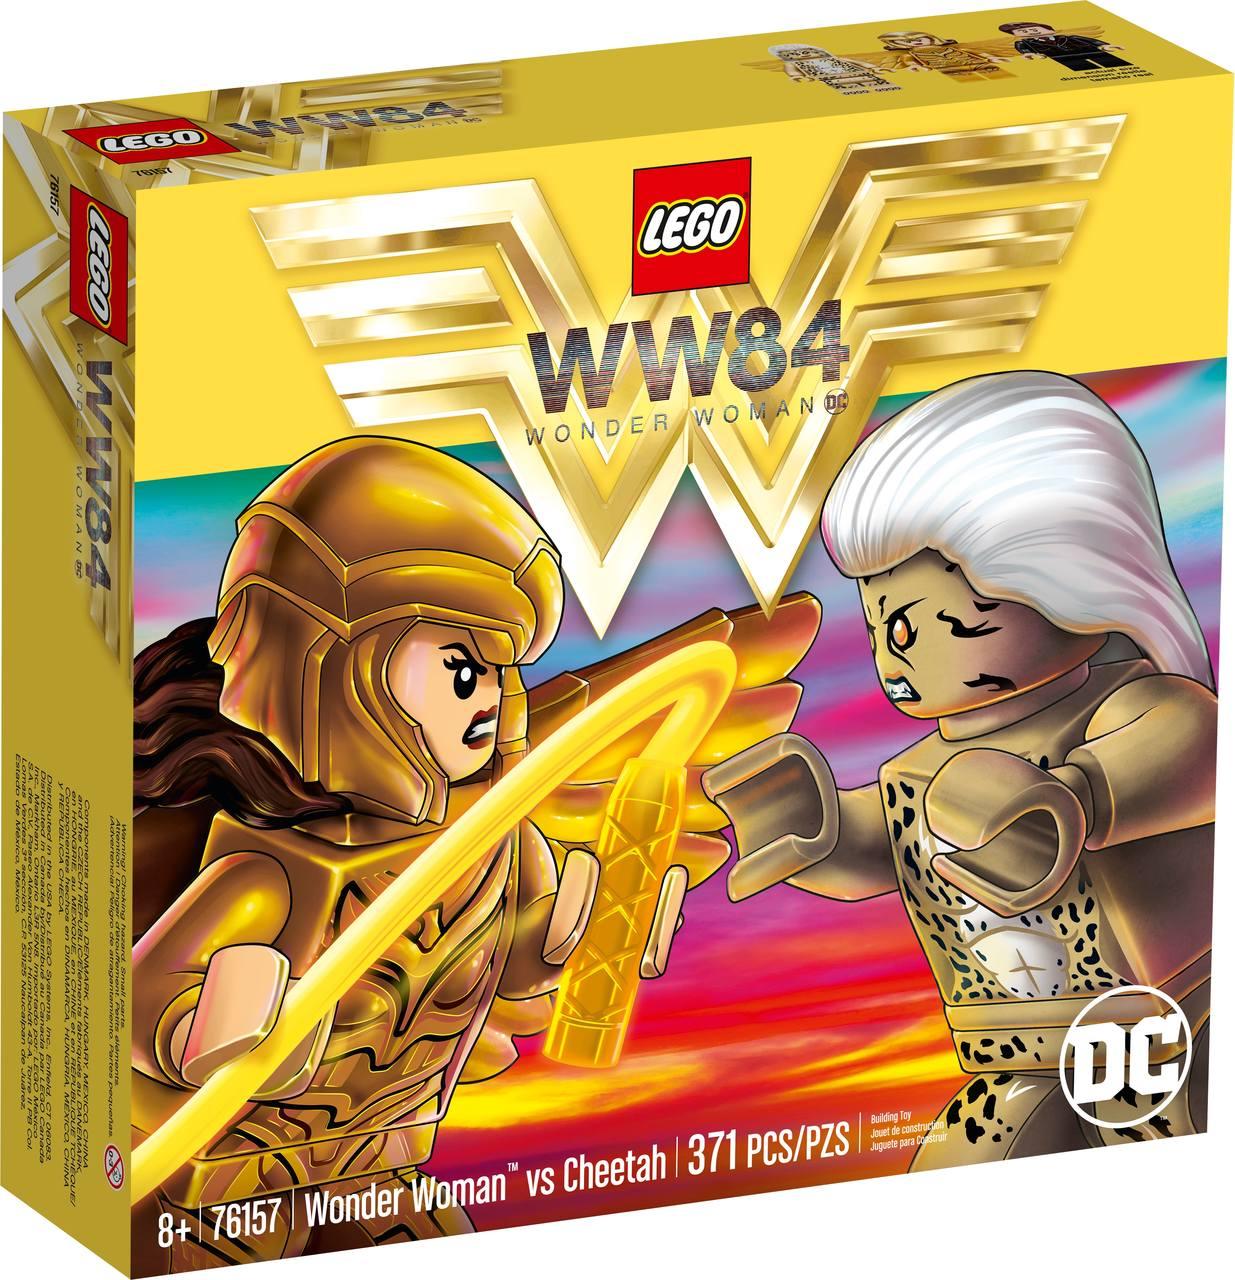 Lego Mulher Maravilha Vs Cheetah 371 Peças - LEGO 76157